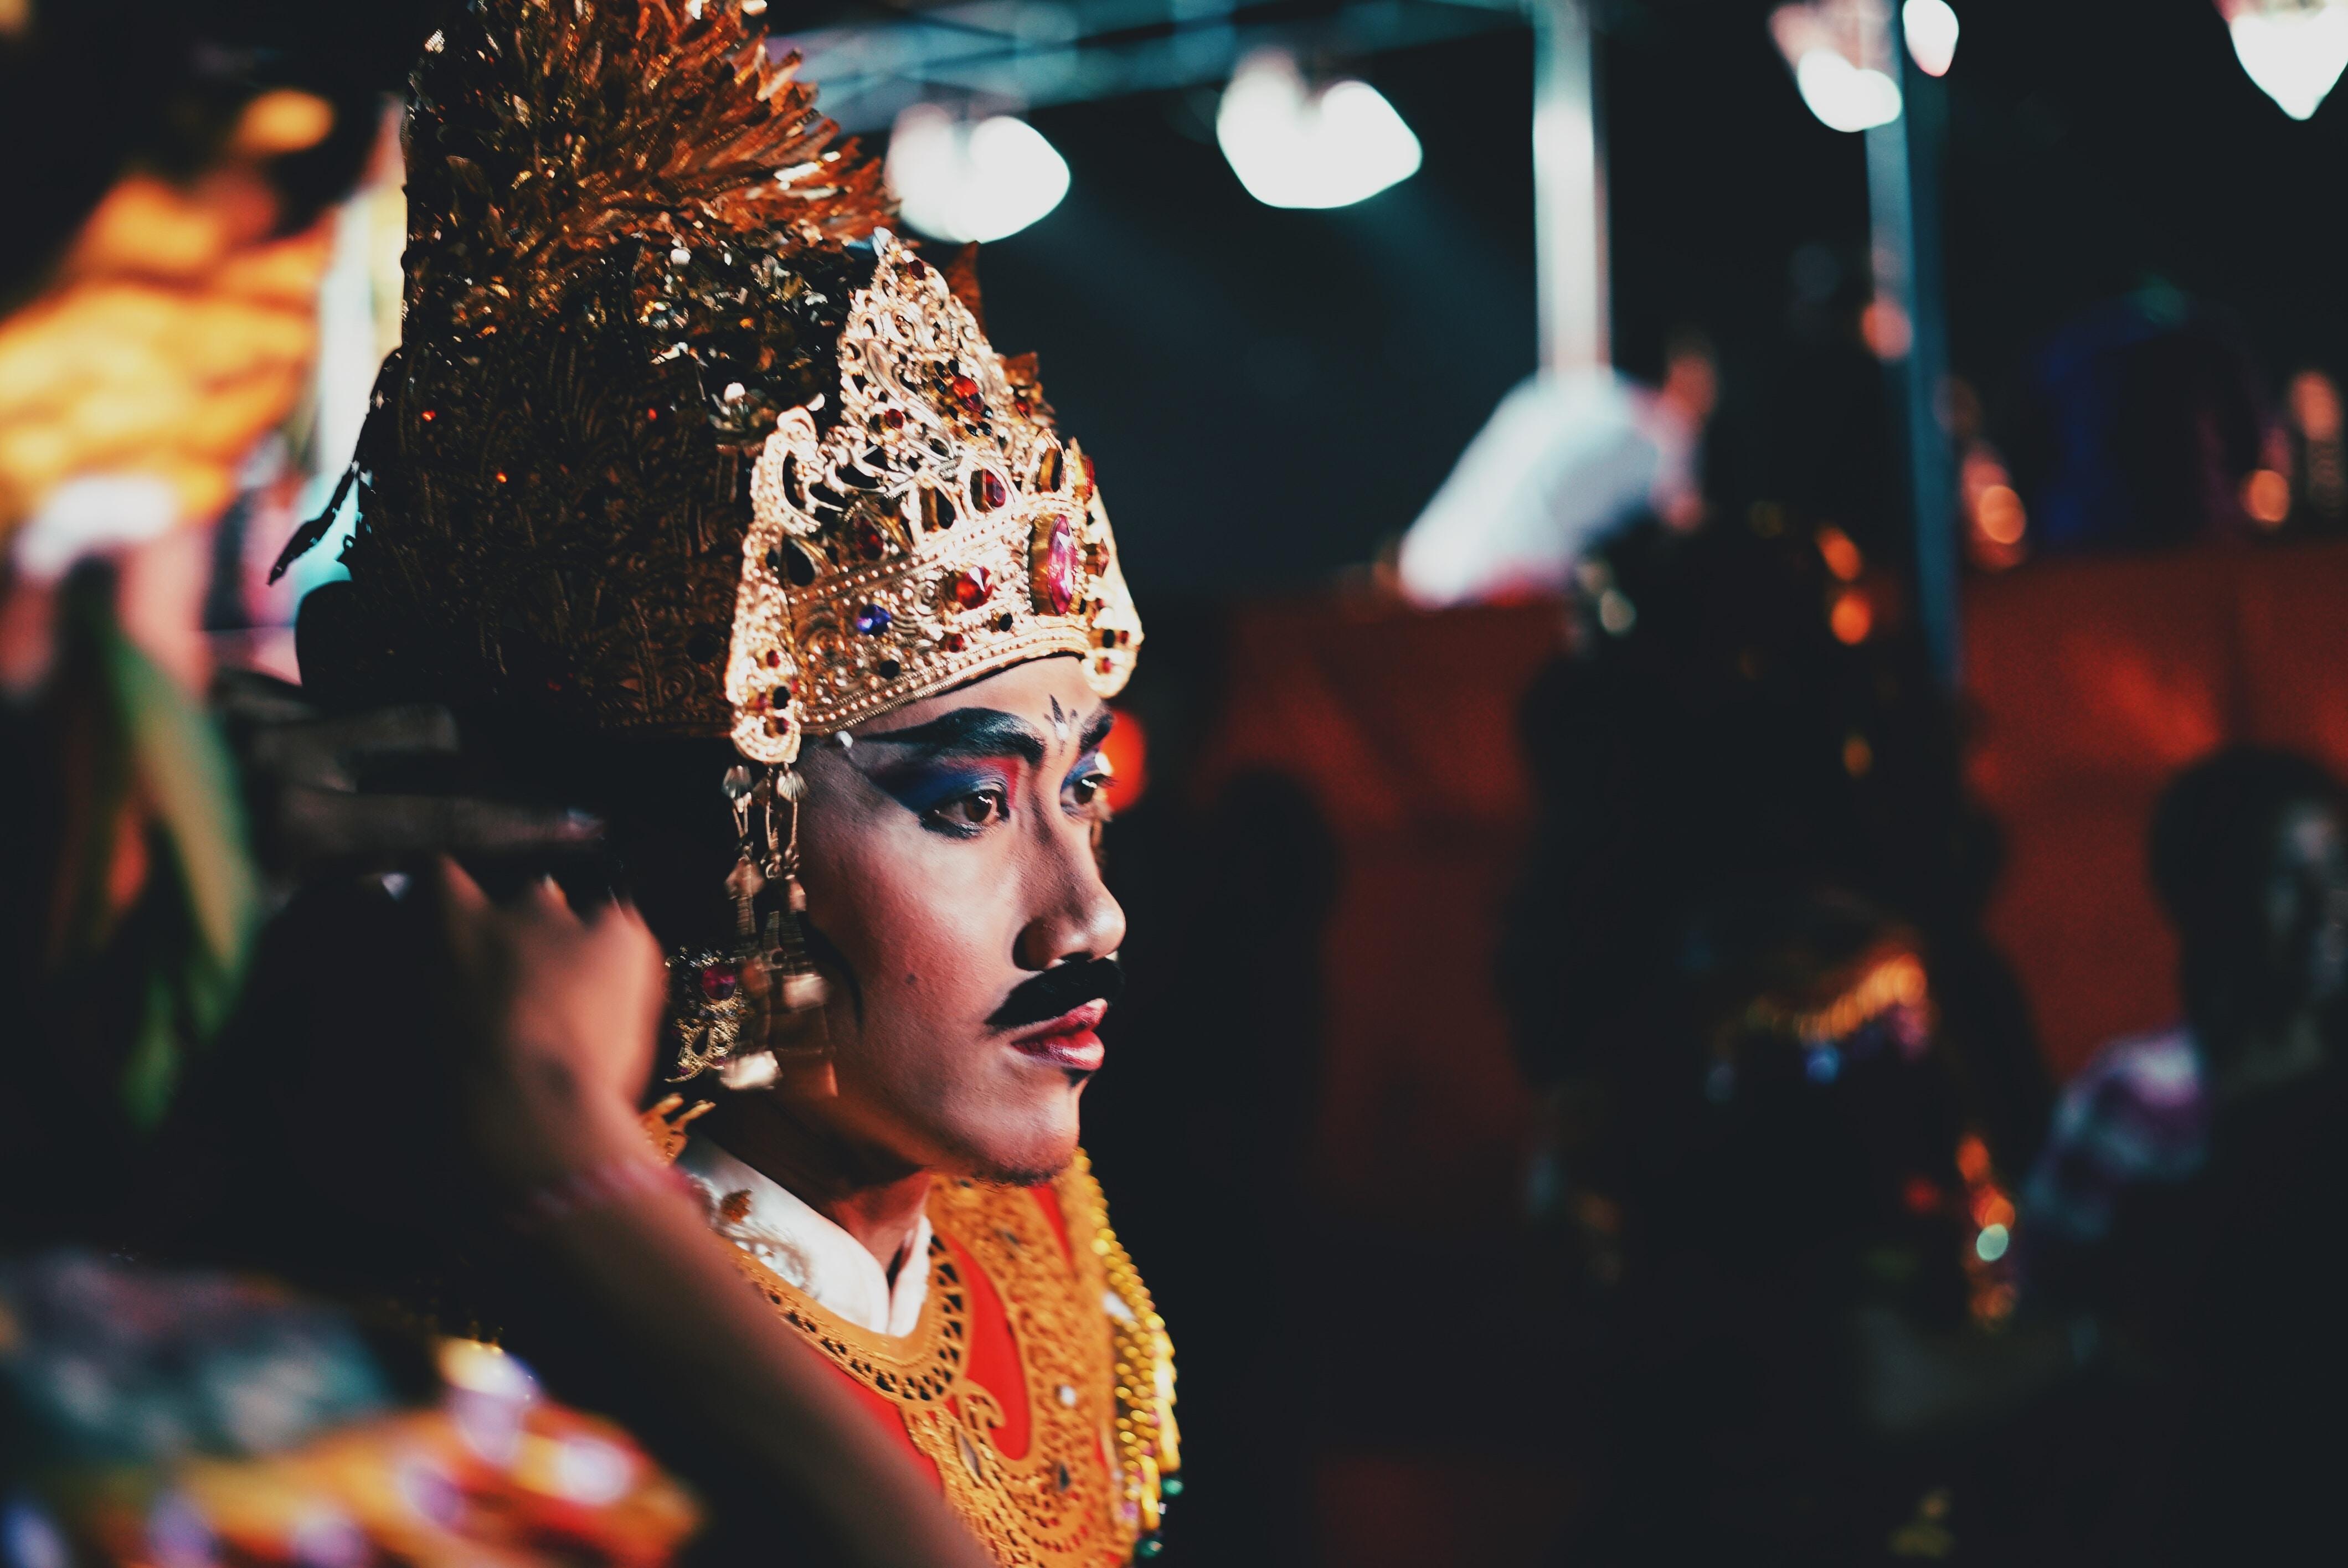 selective photograph of man wearing gold headress